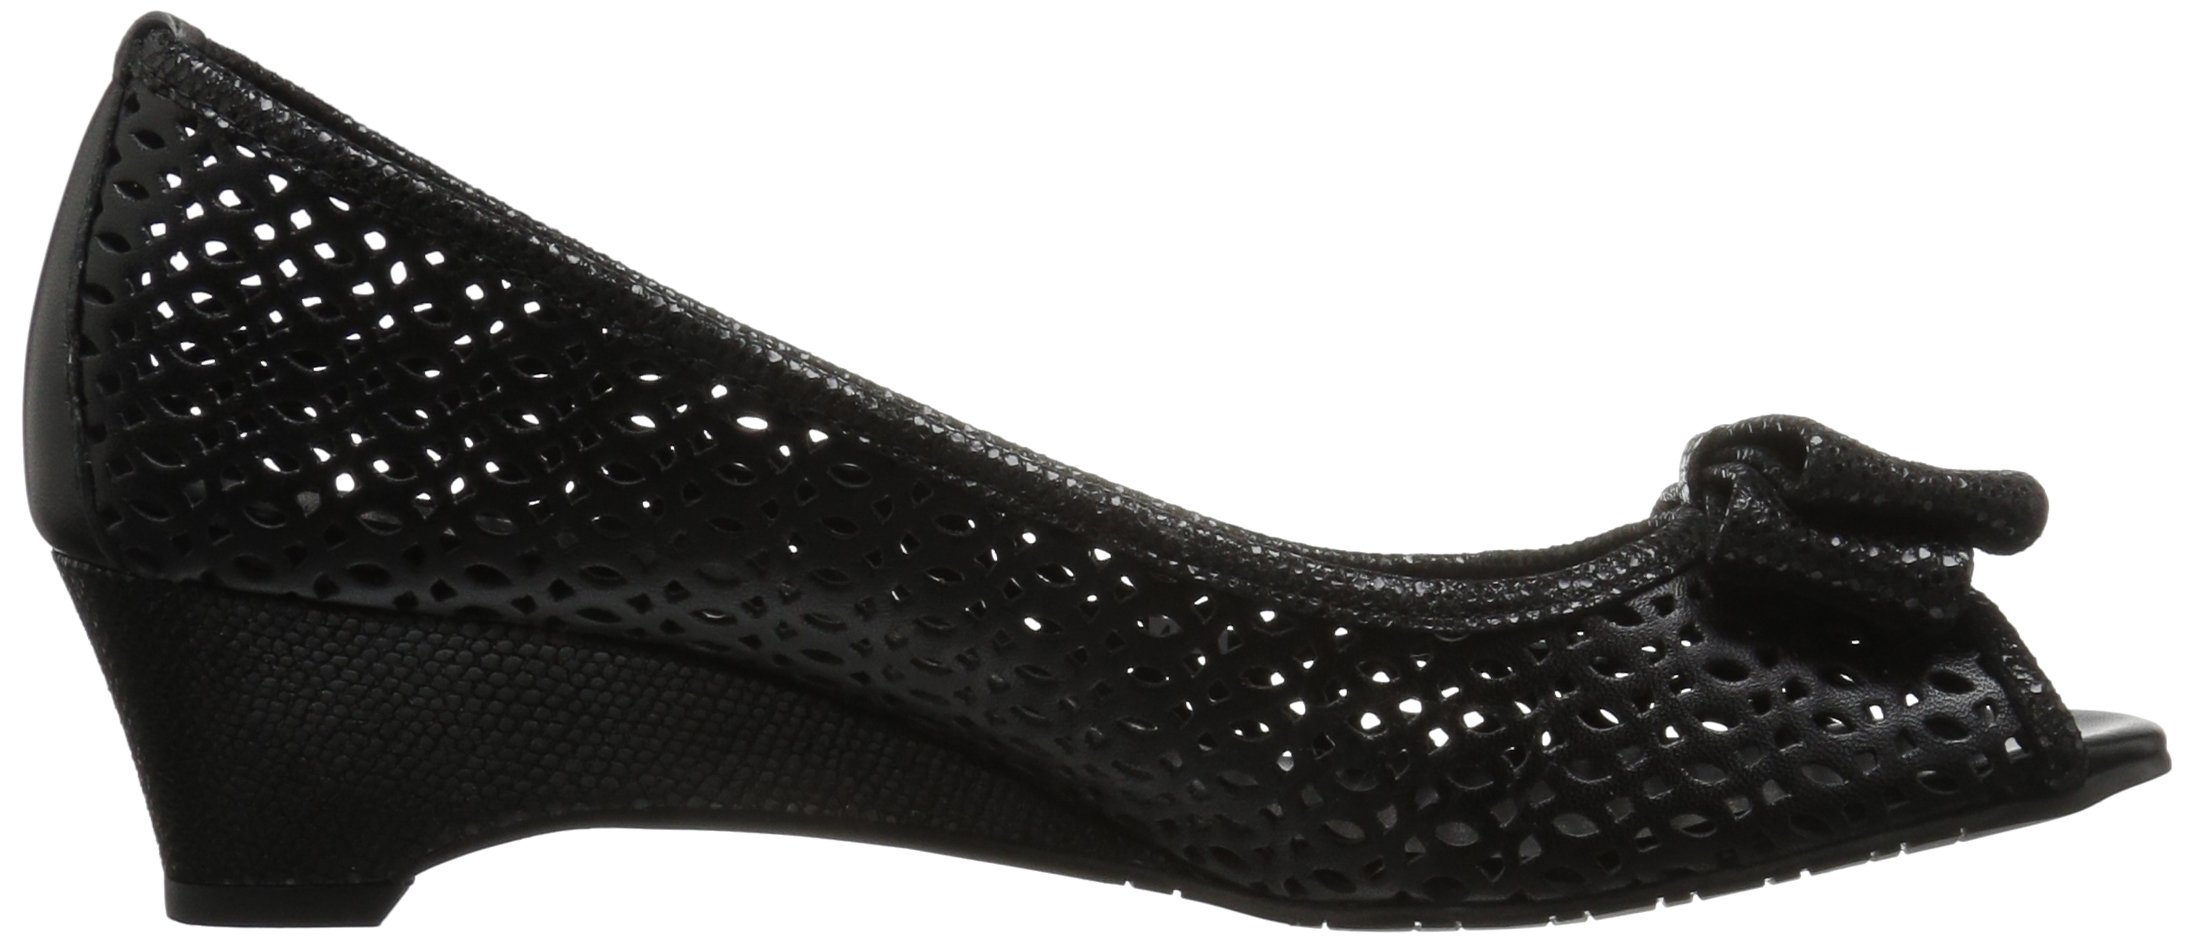 VANELi Women's Brinly Wedge Sandal, Black Perfed Nappa/Black Summer VIP, 9.5 N US by VANELi (Image #7)